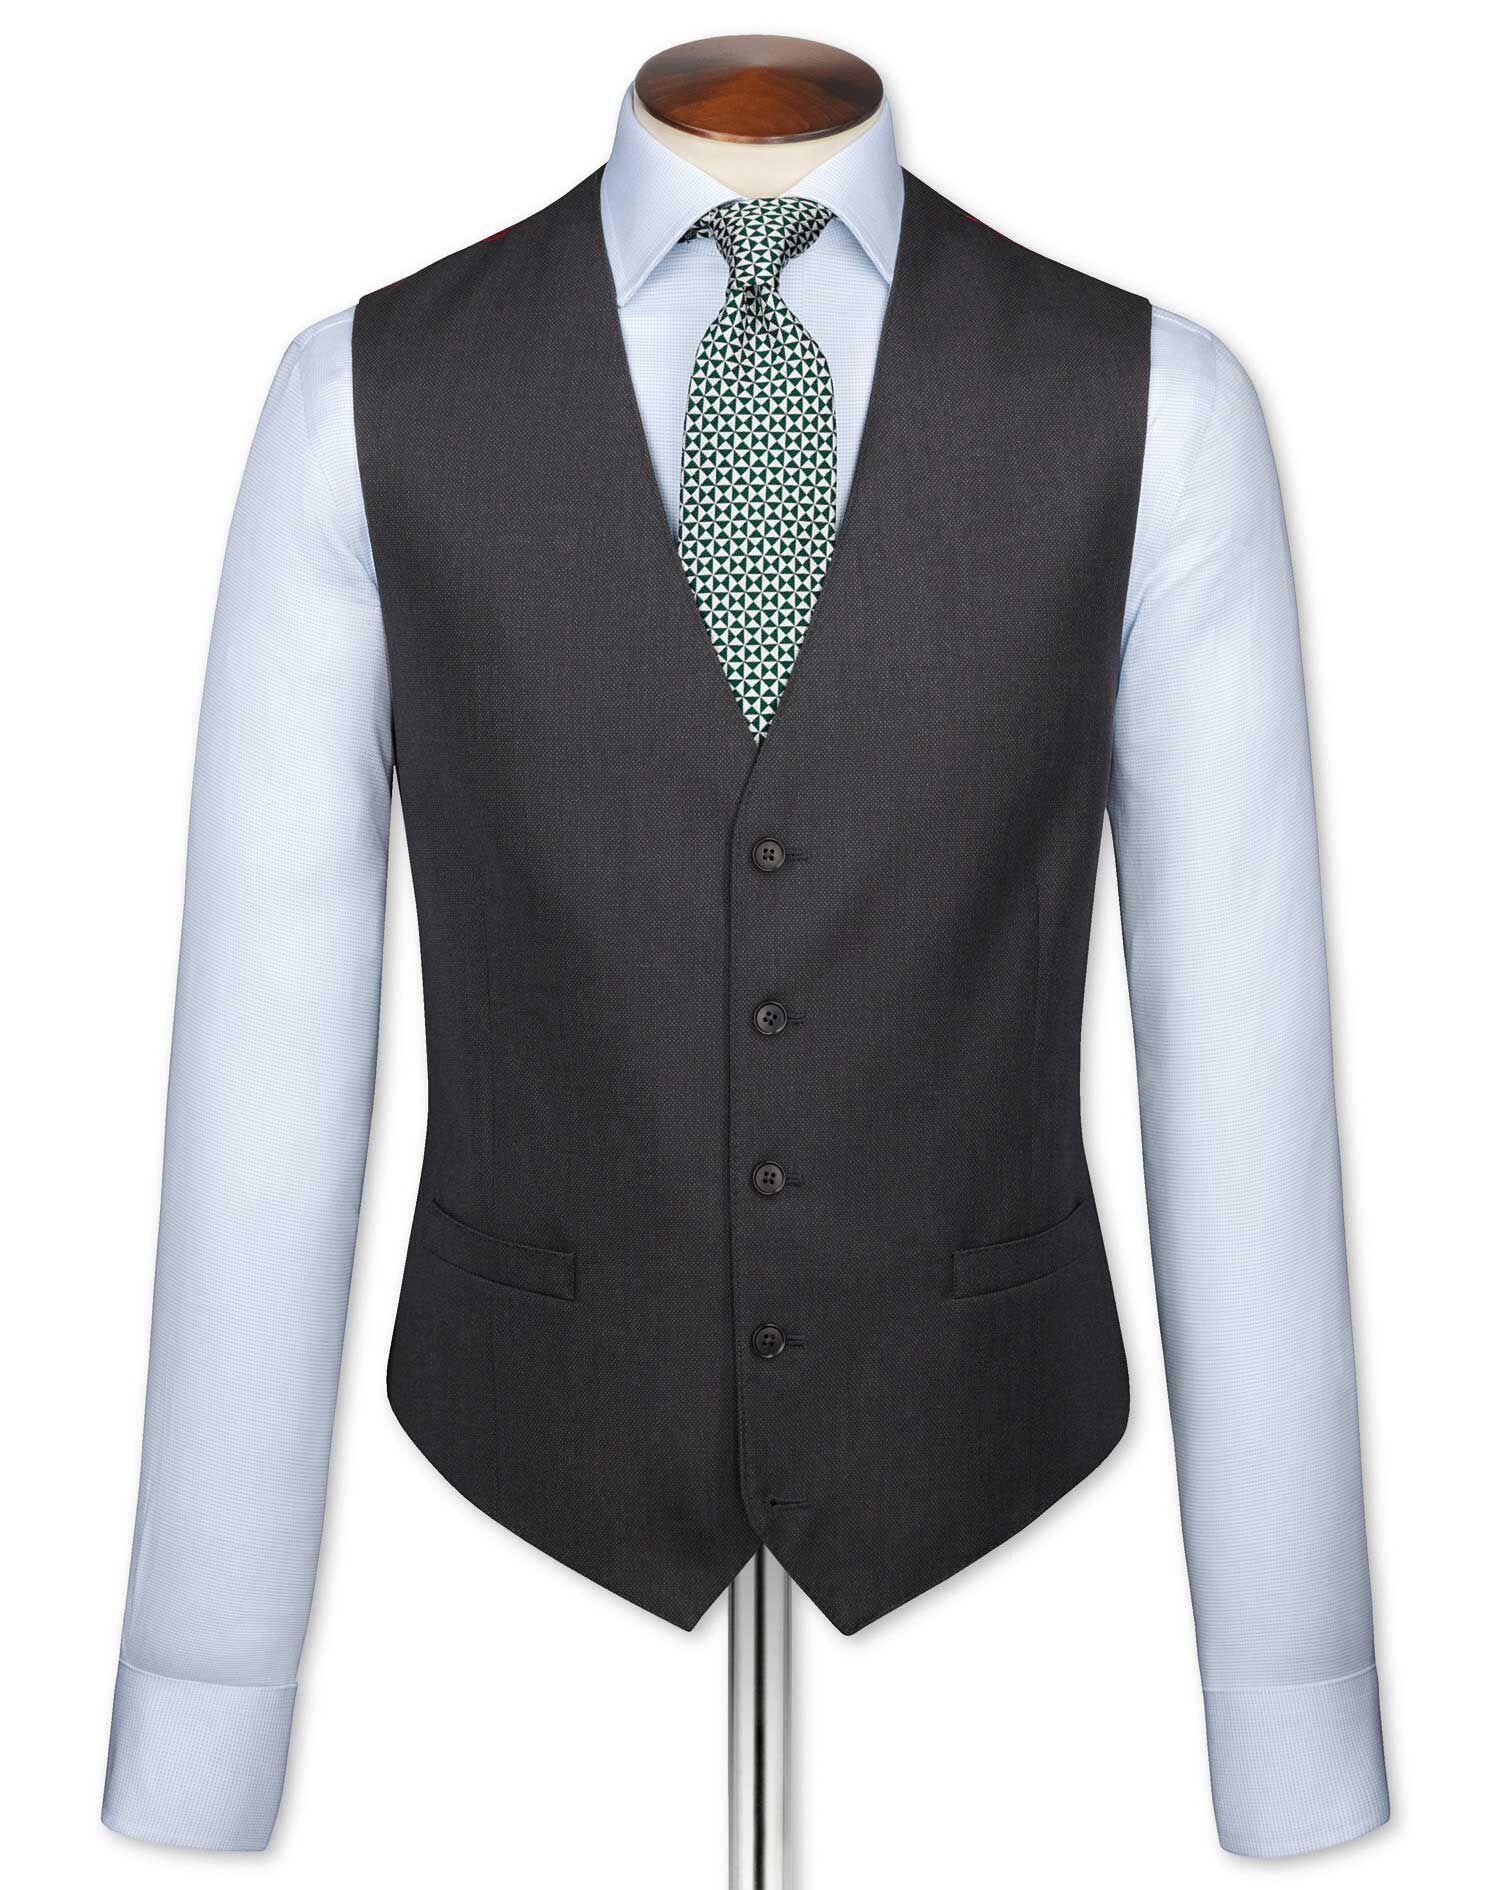 Charcoal Adjustable Fit Birdseye Travel Suit Wool Waistcoat Size w36 by Charles Tyrwhitt